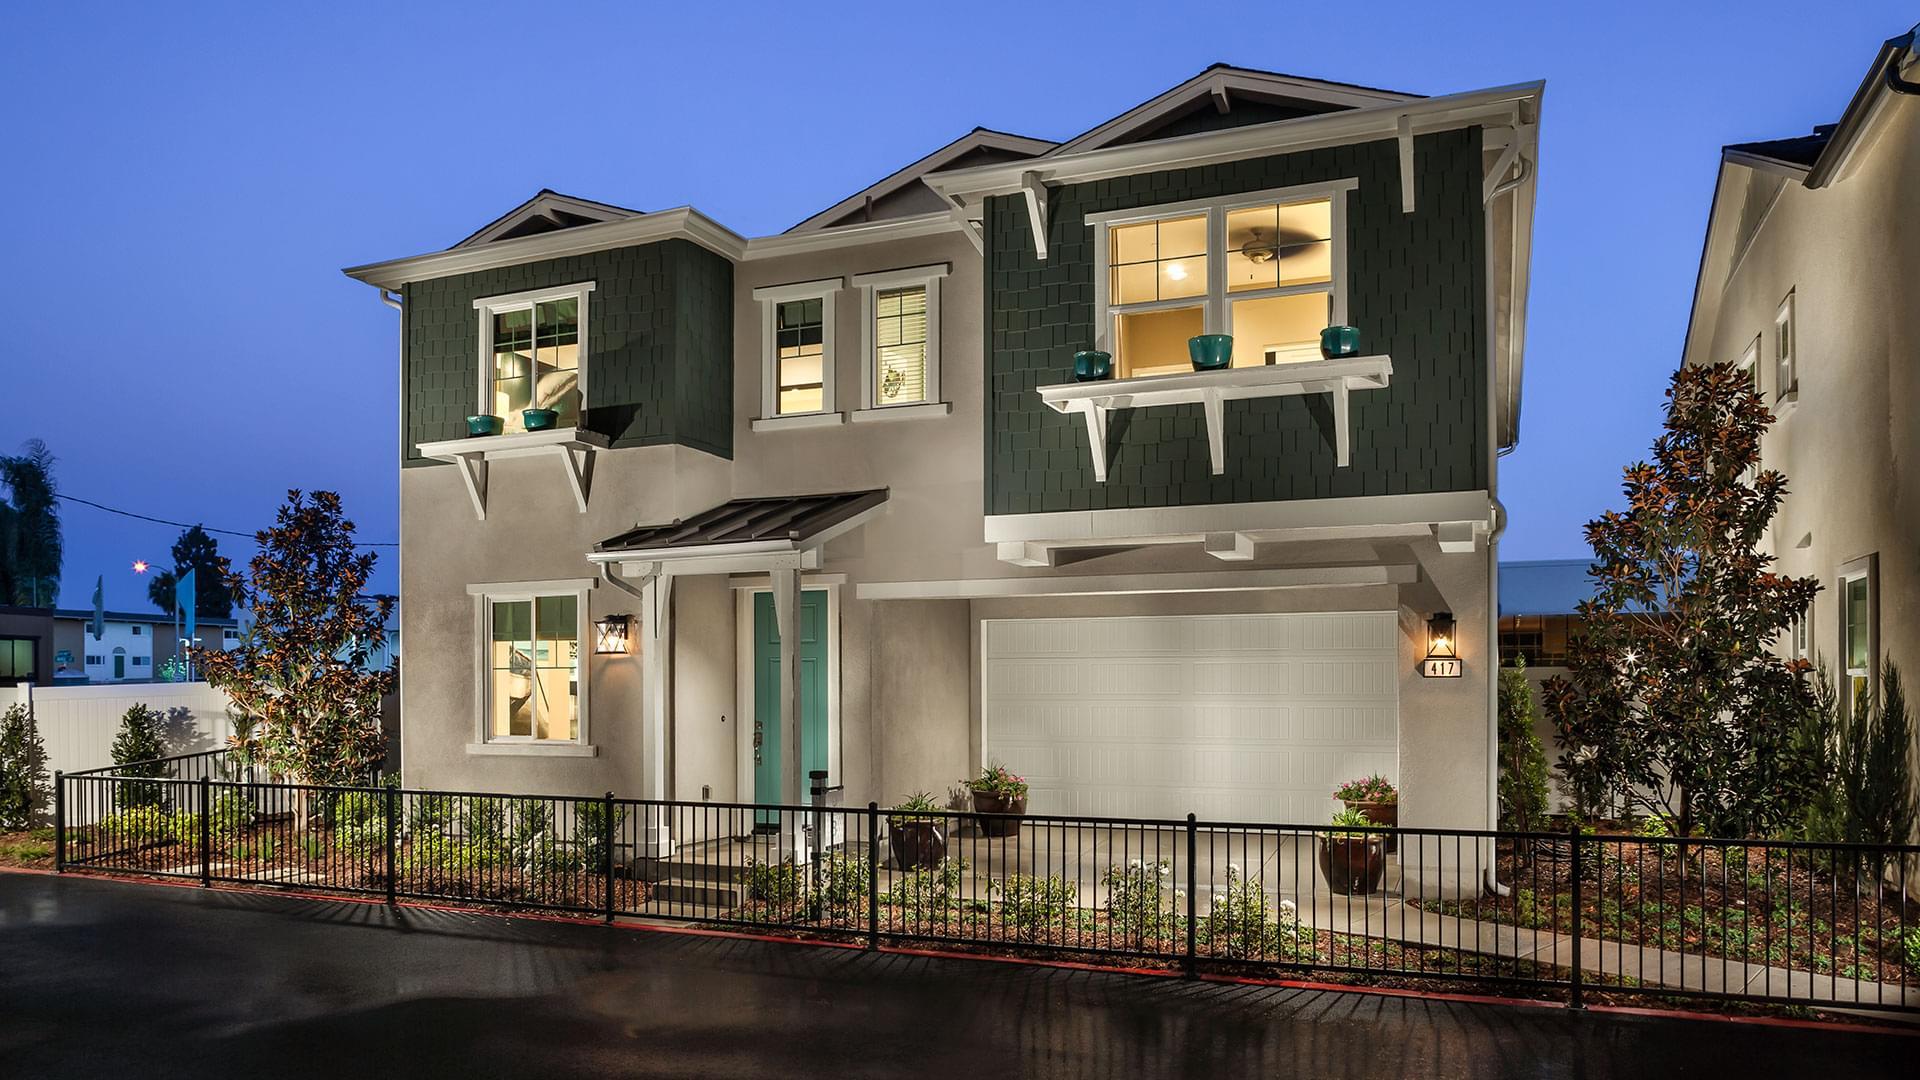 417 Aura Drive in Costa Mesa , CA by DeNova Homes